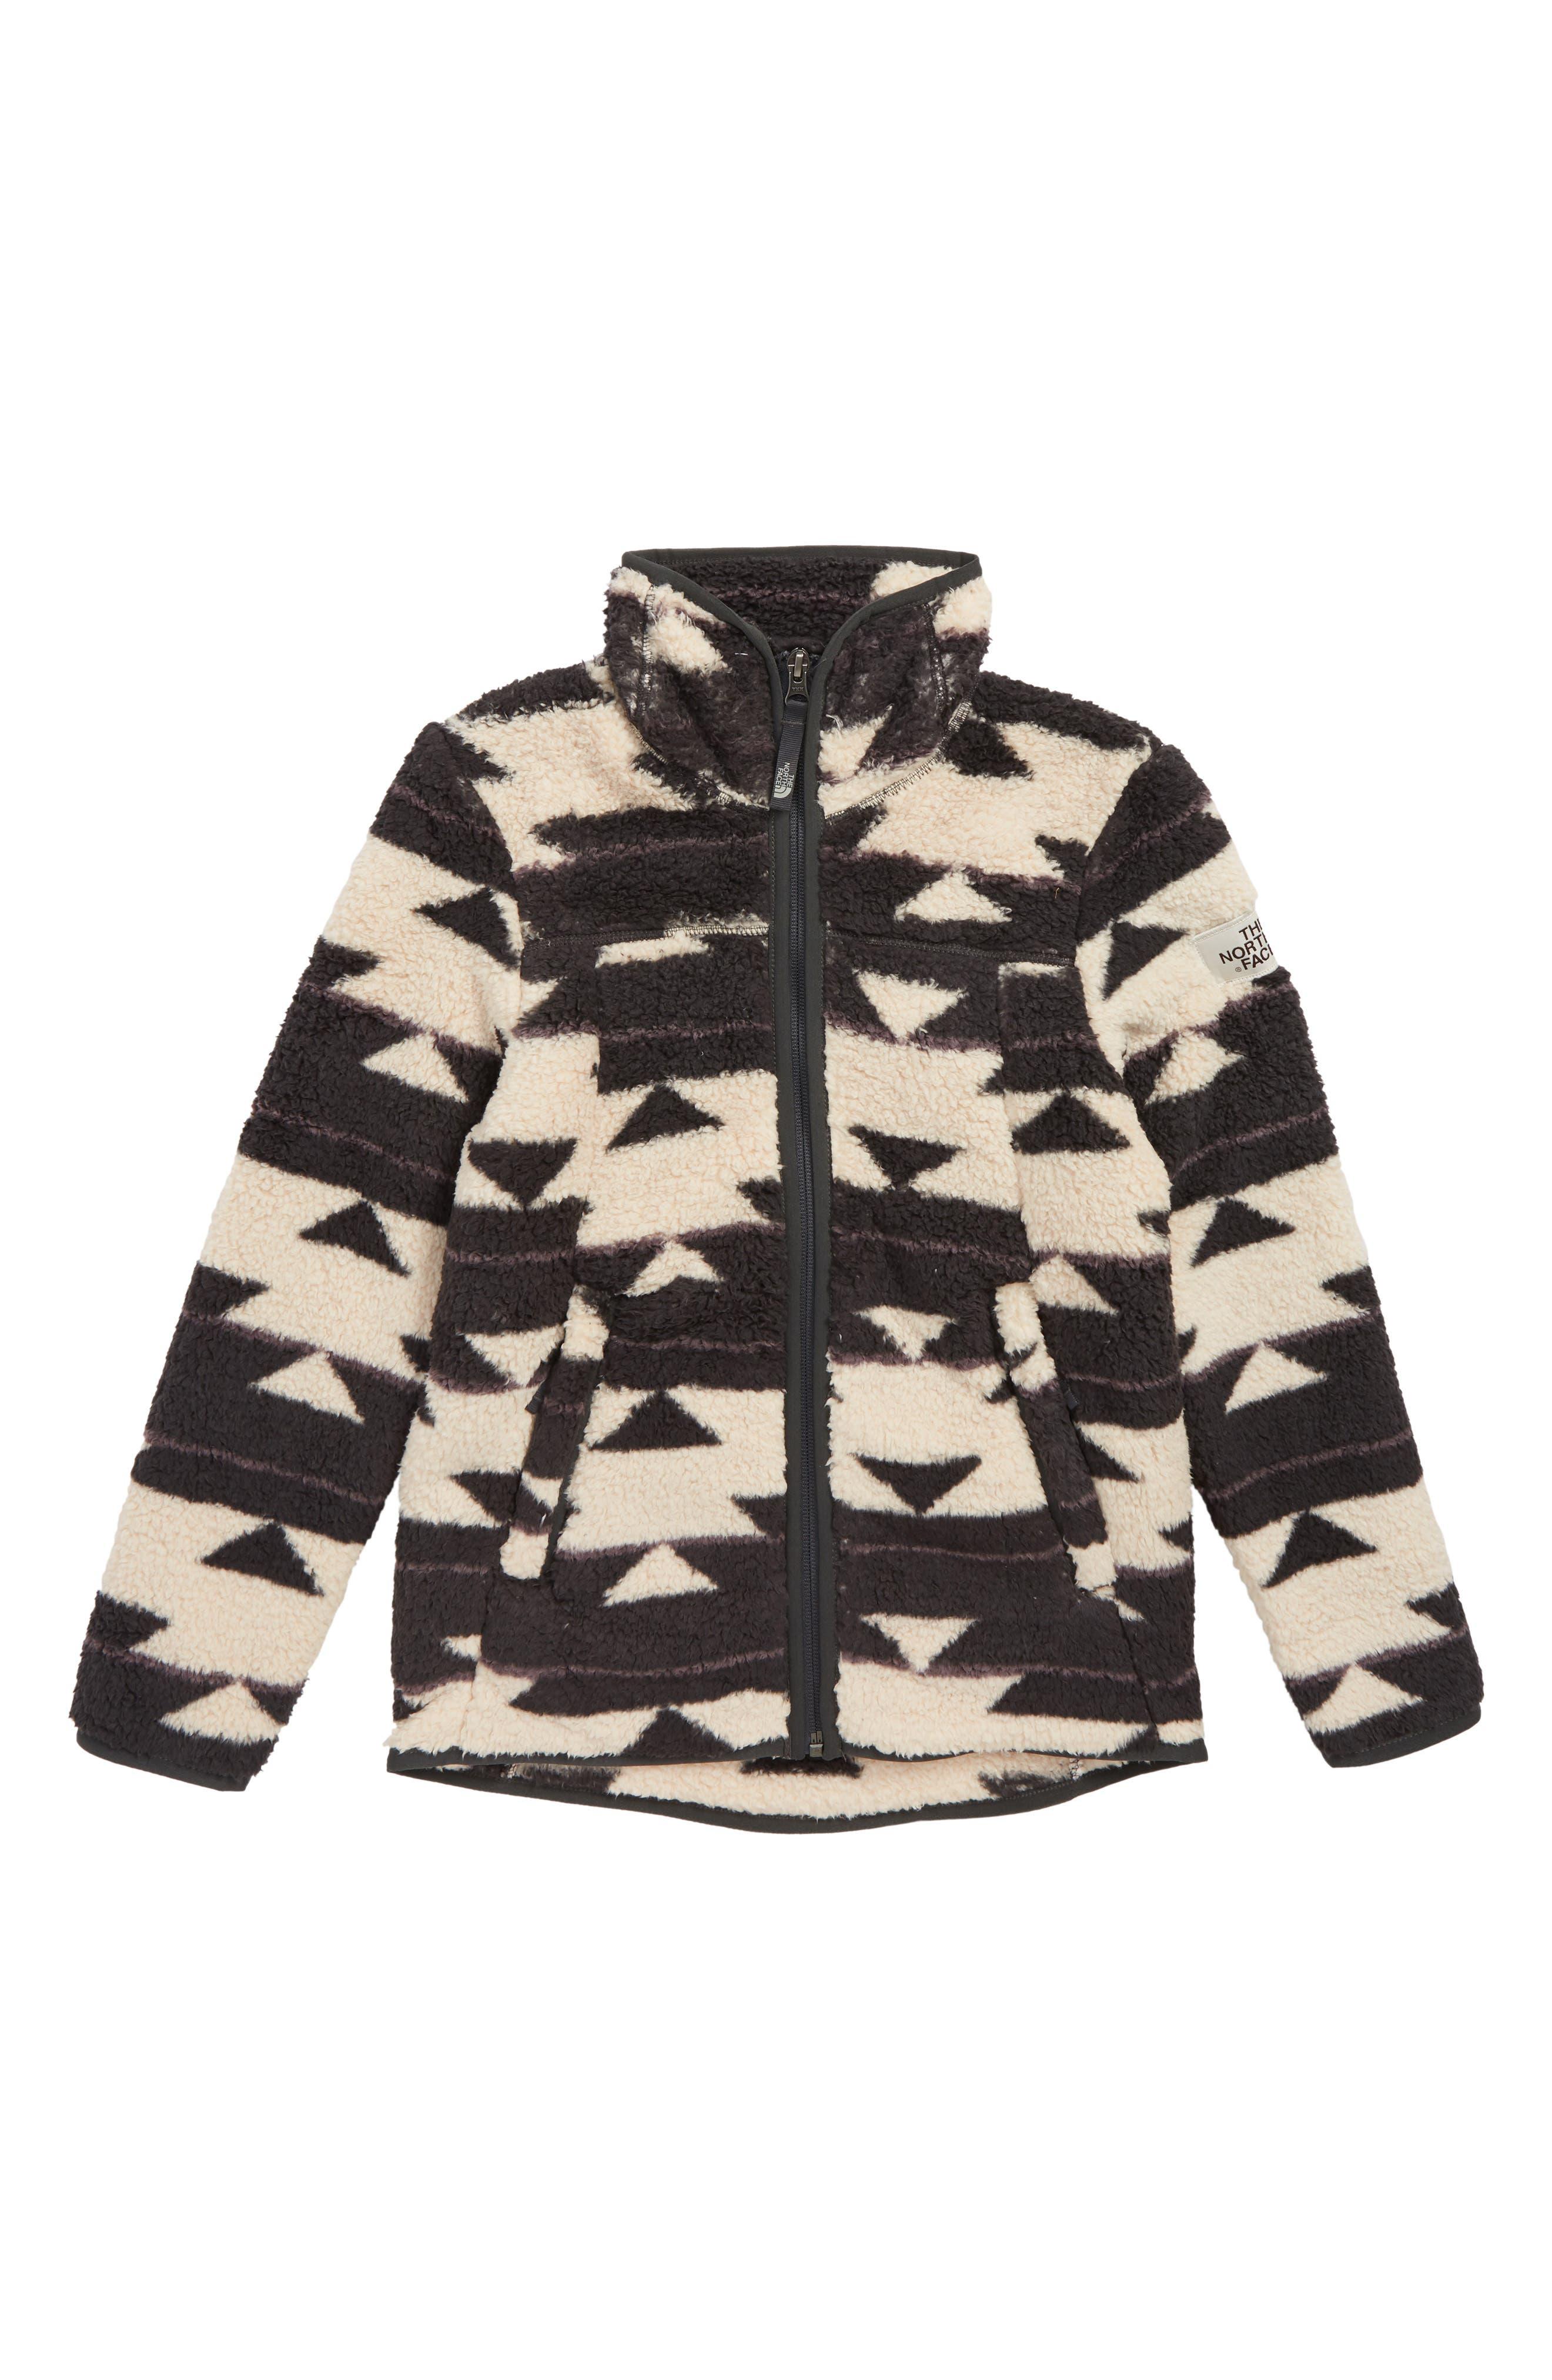 Campshire Fleece Jacket,                             Main thumbnail 1, color,                             PEYOTE BEIGE CA BASKET